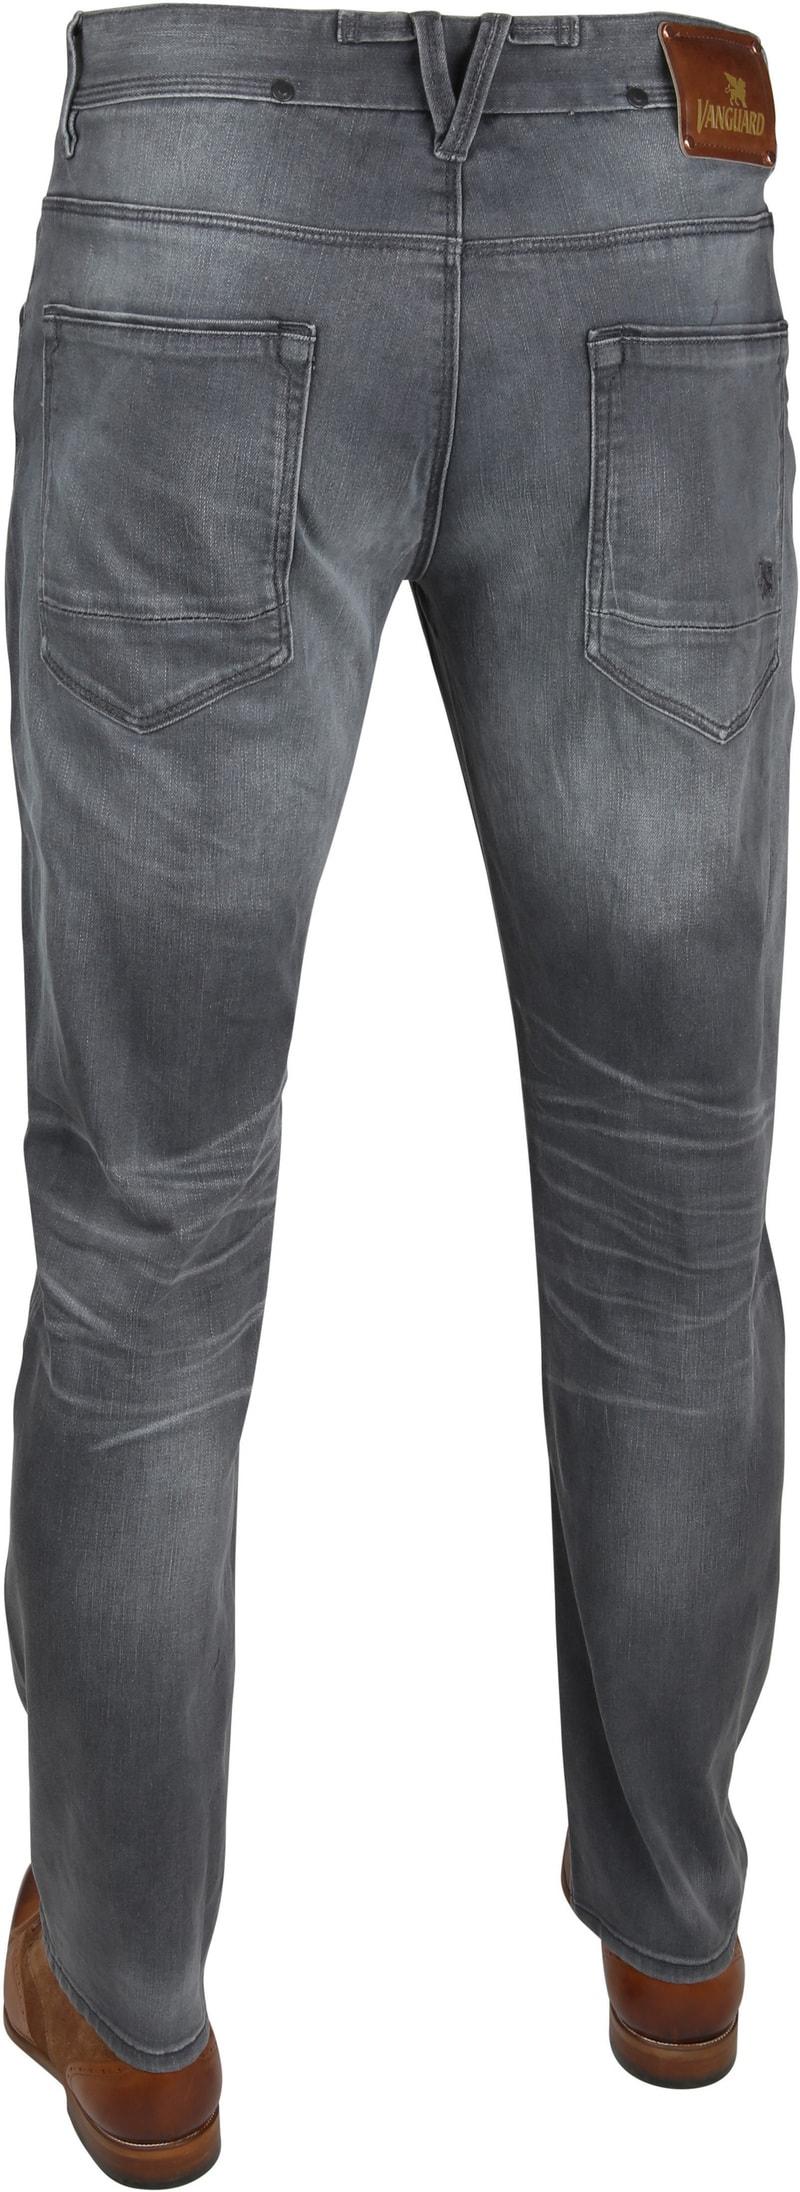 Vanguard V7 Rider Jeans Antraciet foto 3